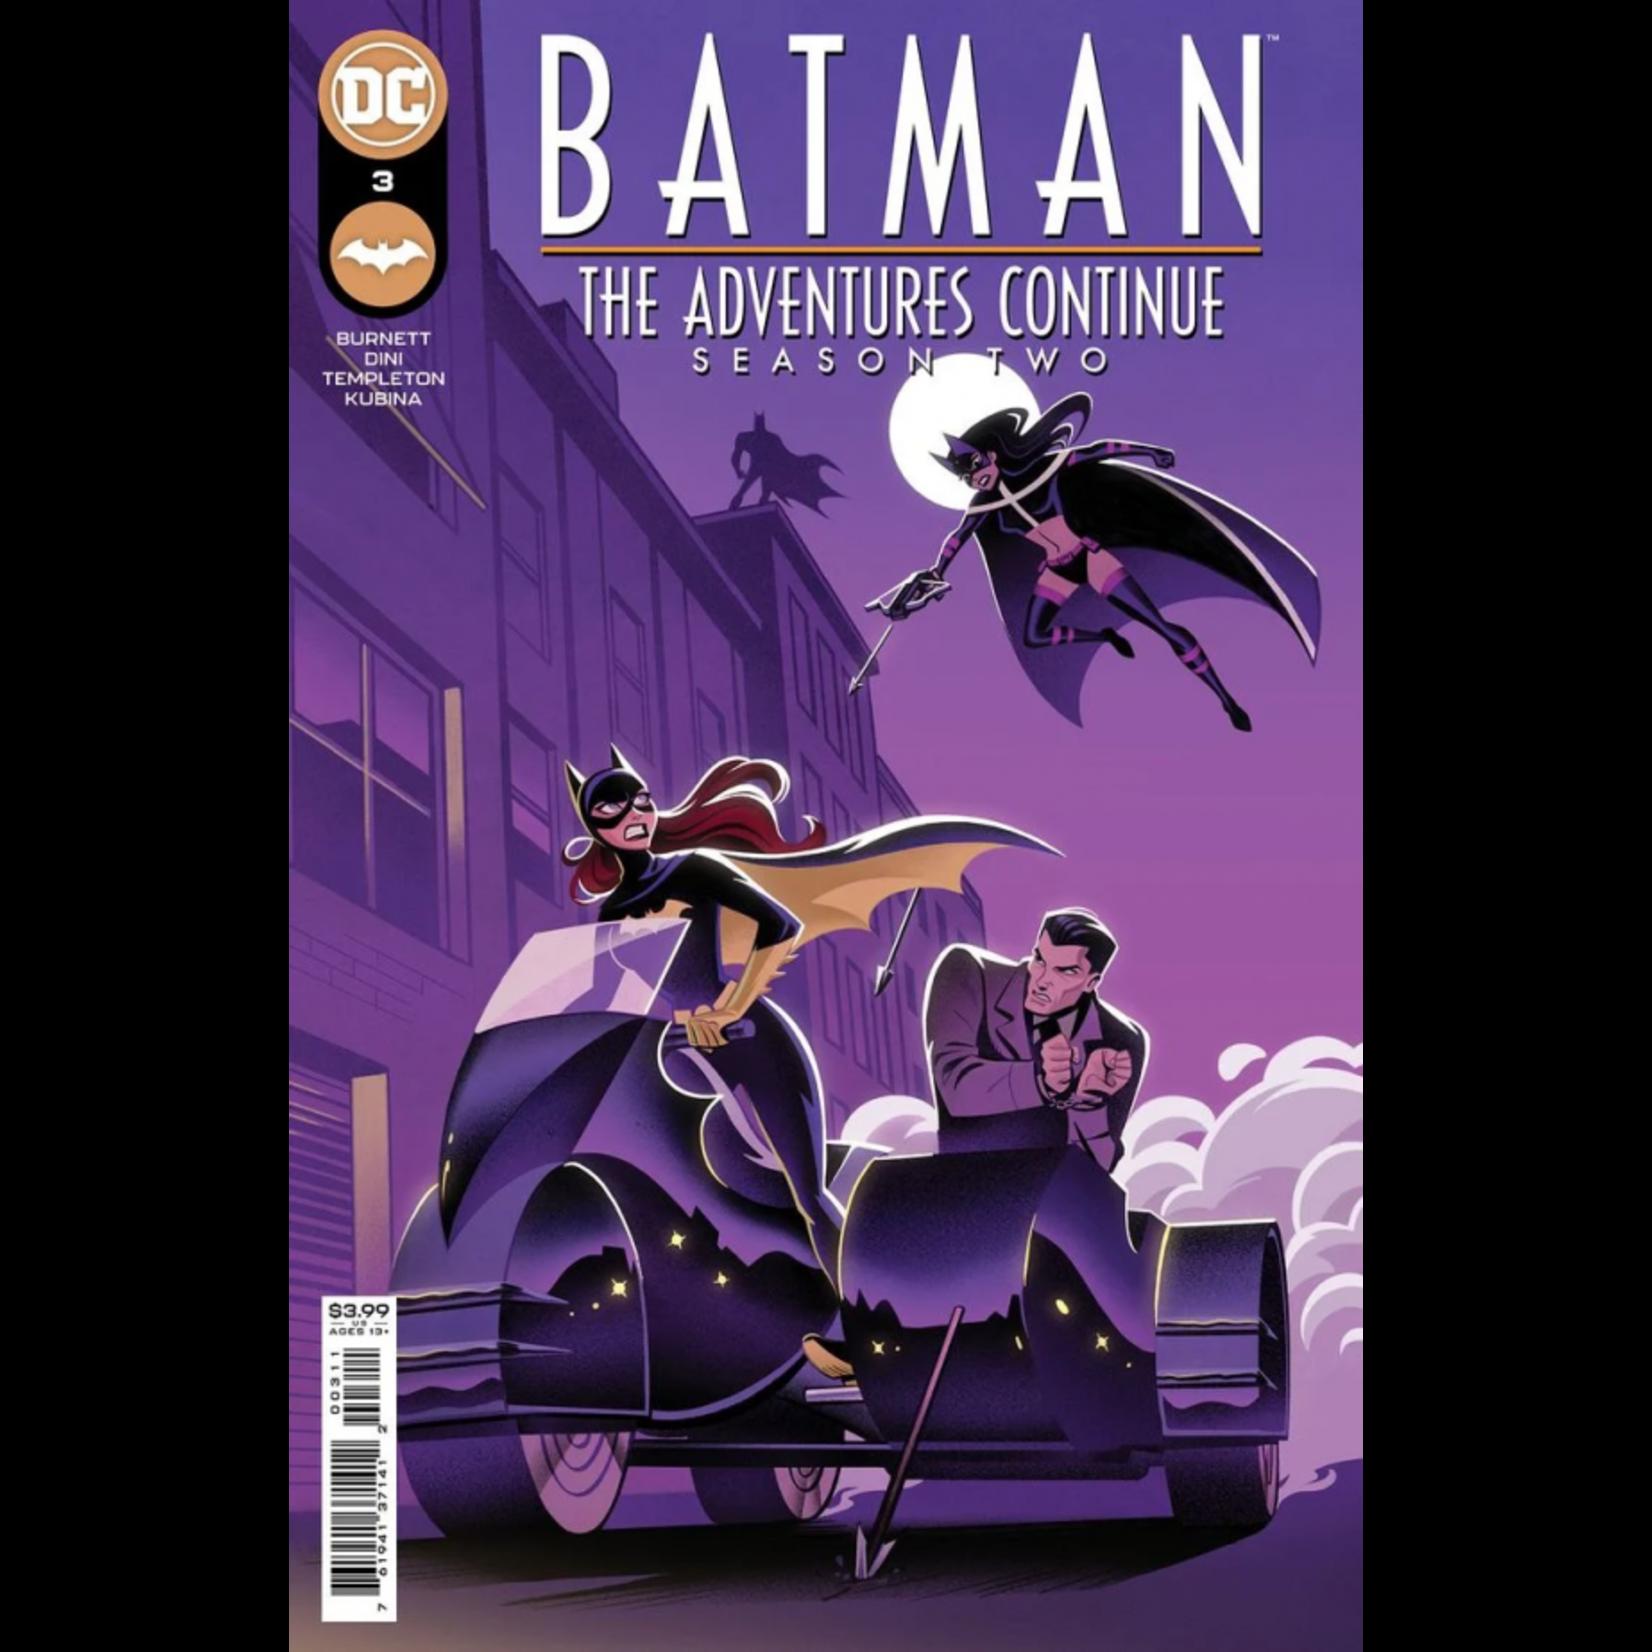 DC Comics Batman The Adventures continue Season 2 #3 cover A